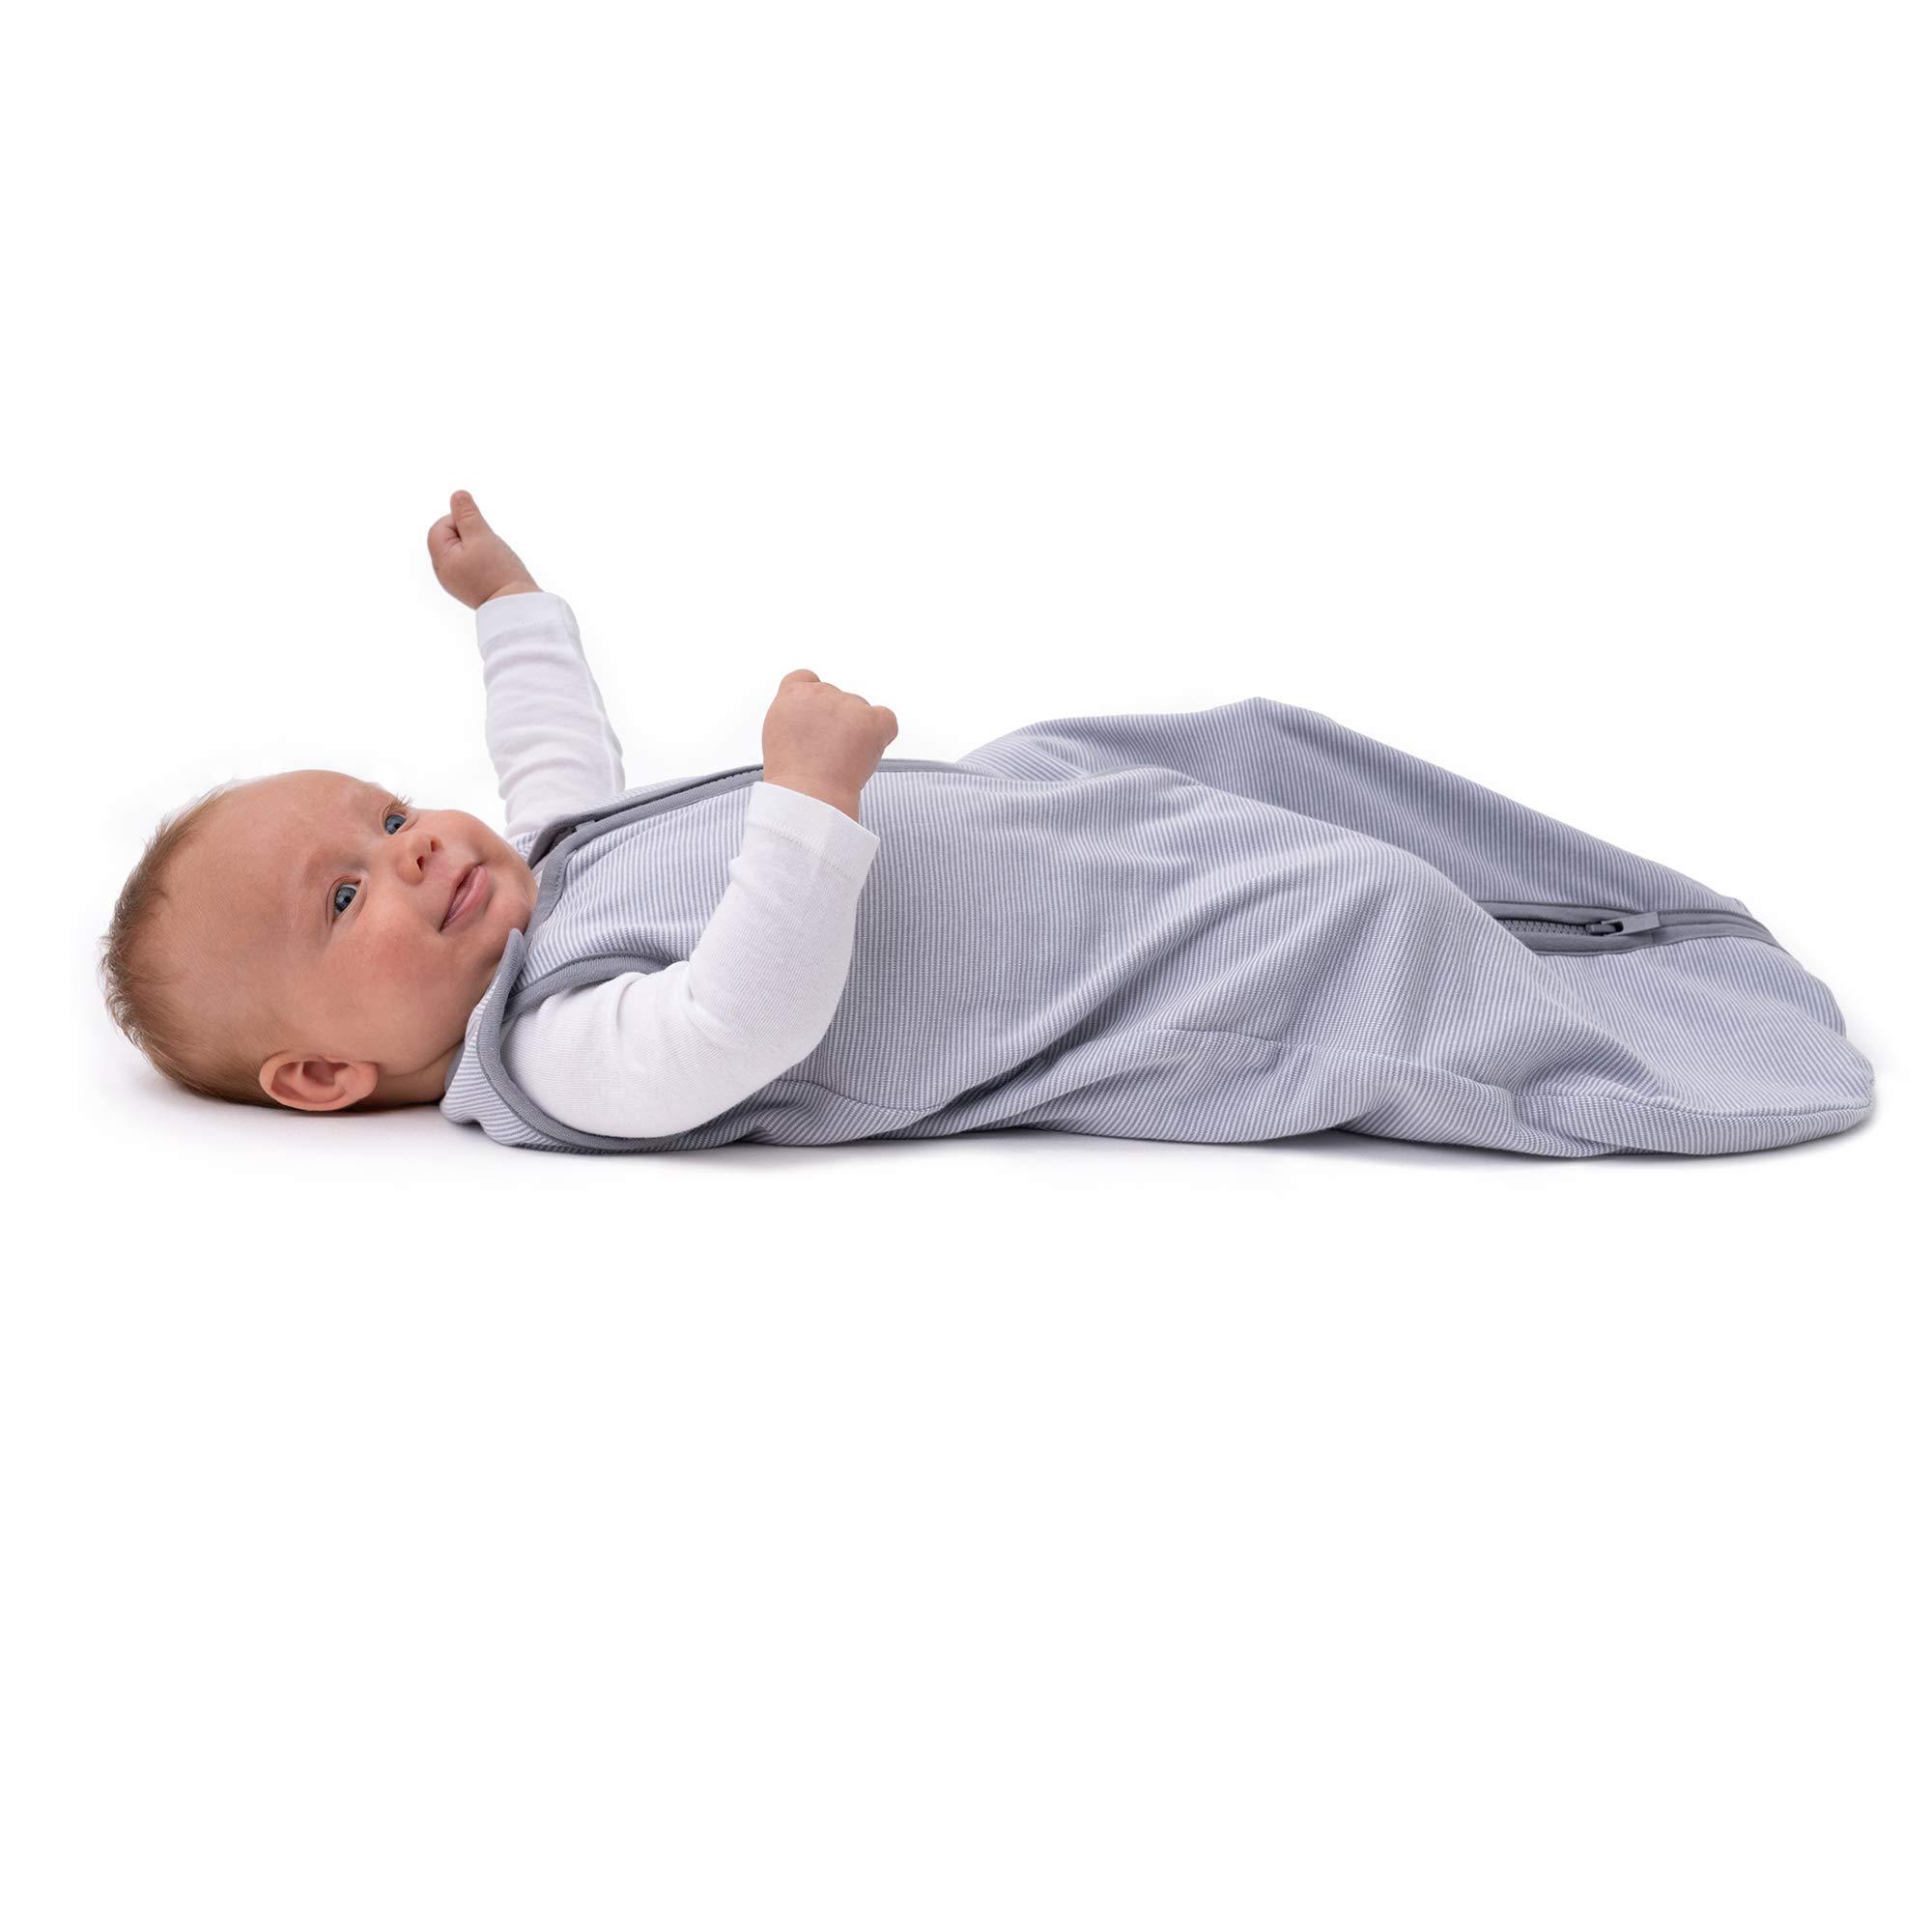 baby deedee Sleep Nest Lite Sleeping Bag Sack, Gray Stripes, Medium (6-18 Months)